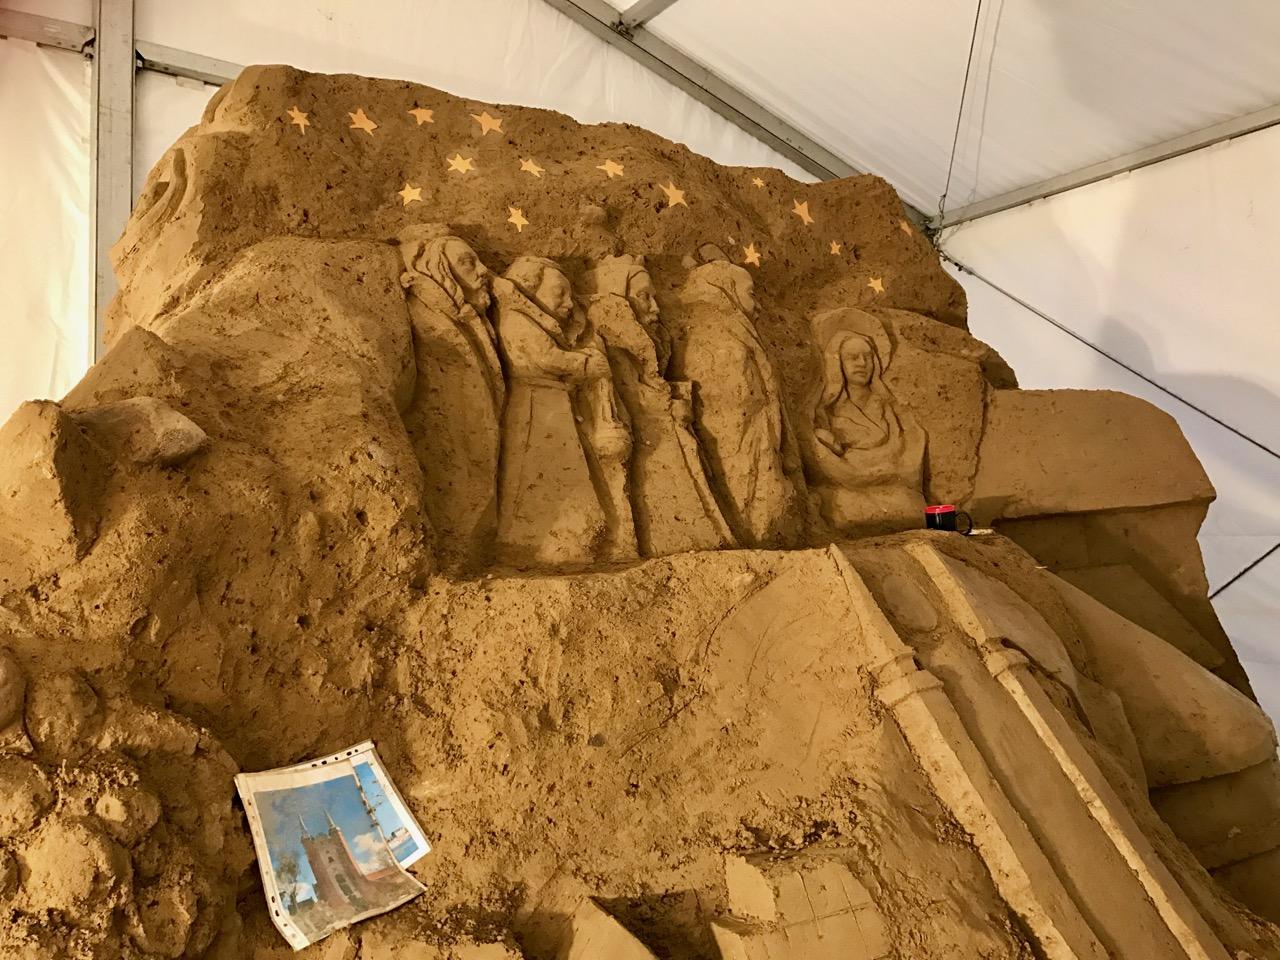 Oliwska szopka z piasku 2016